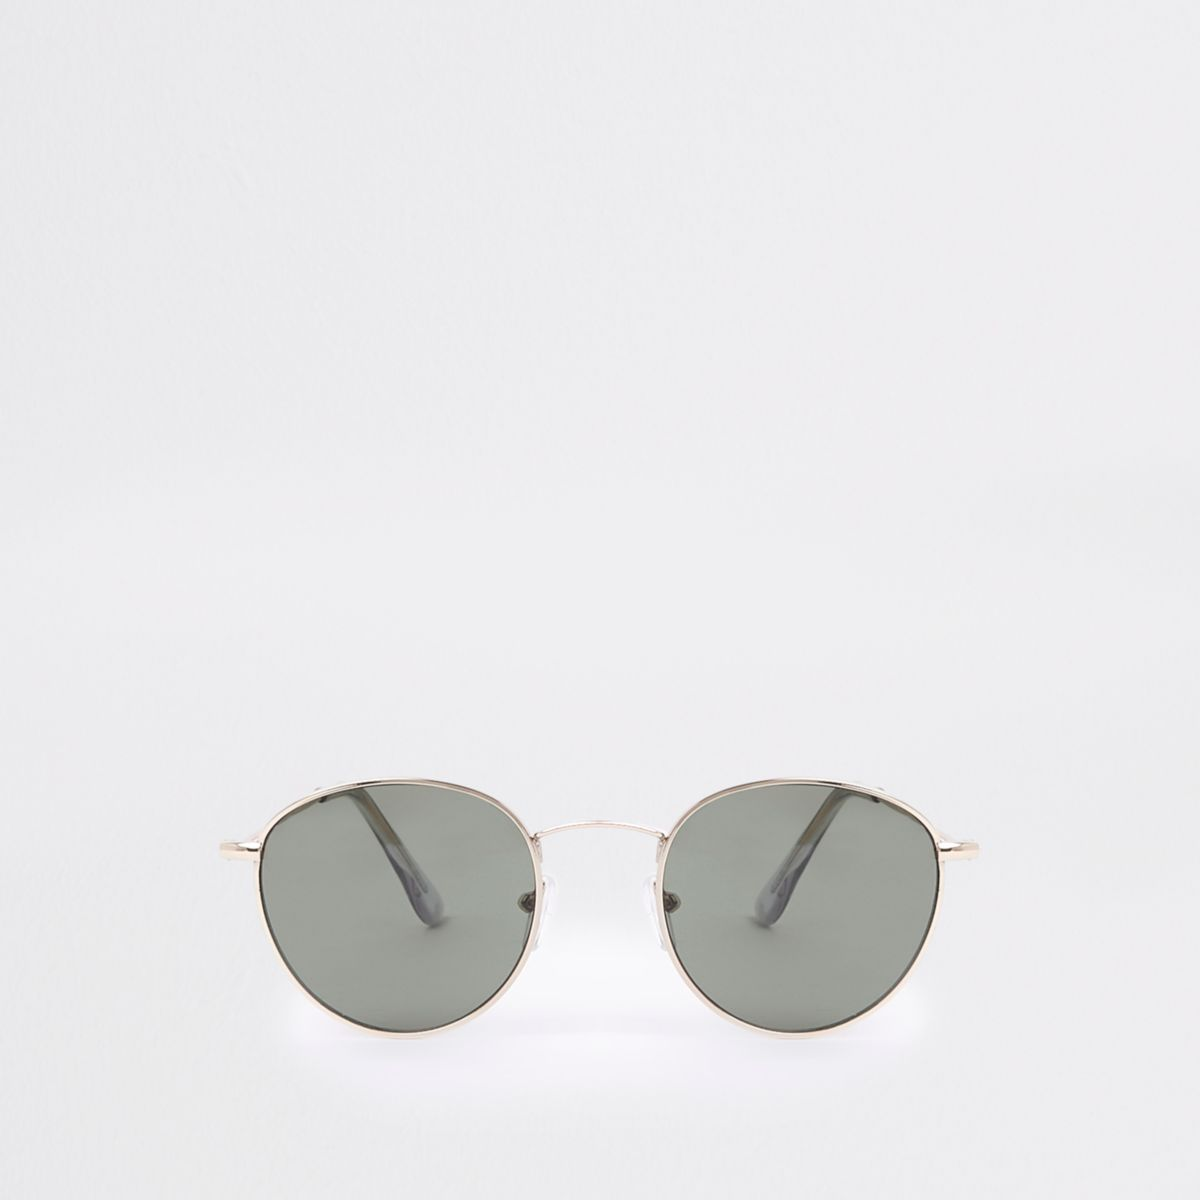 Gold tone round grey lens sunglasses